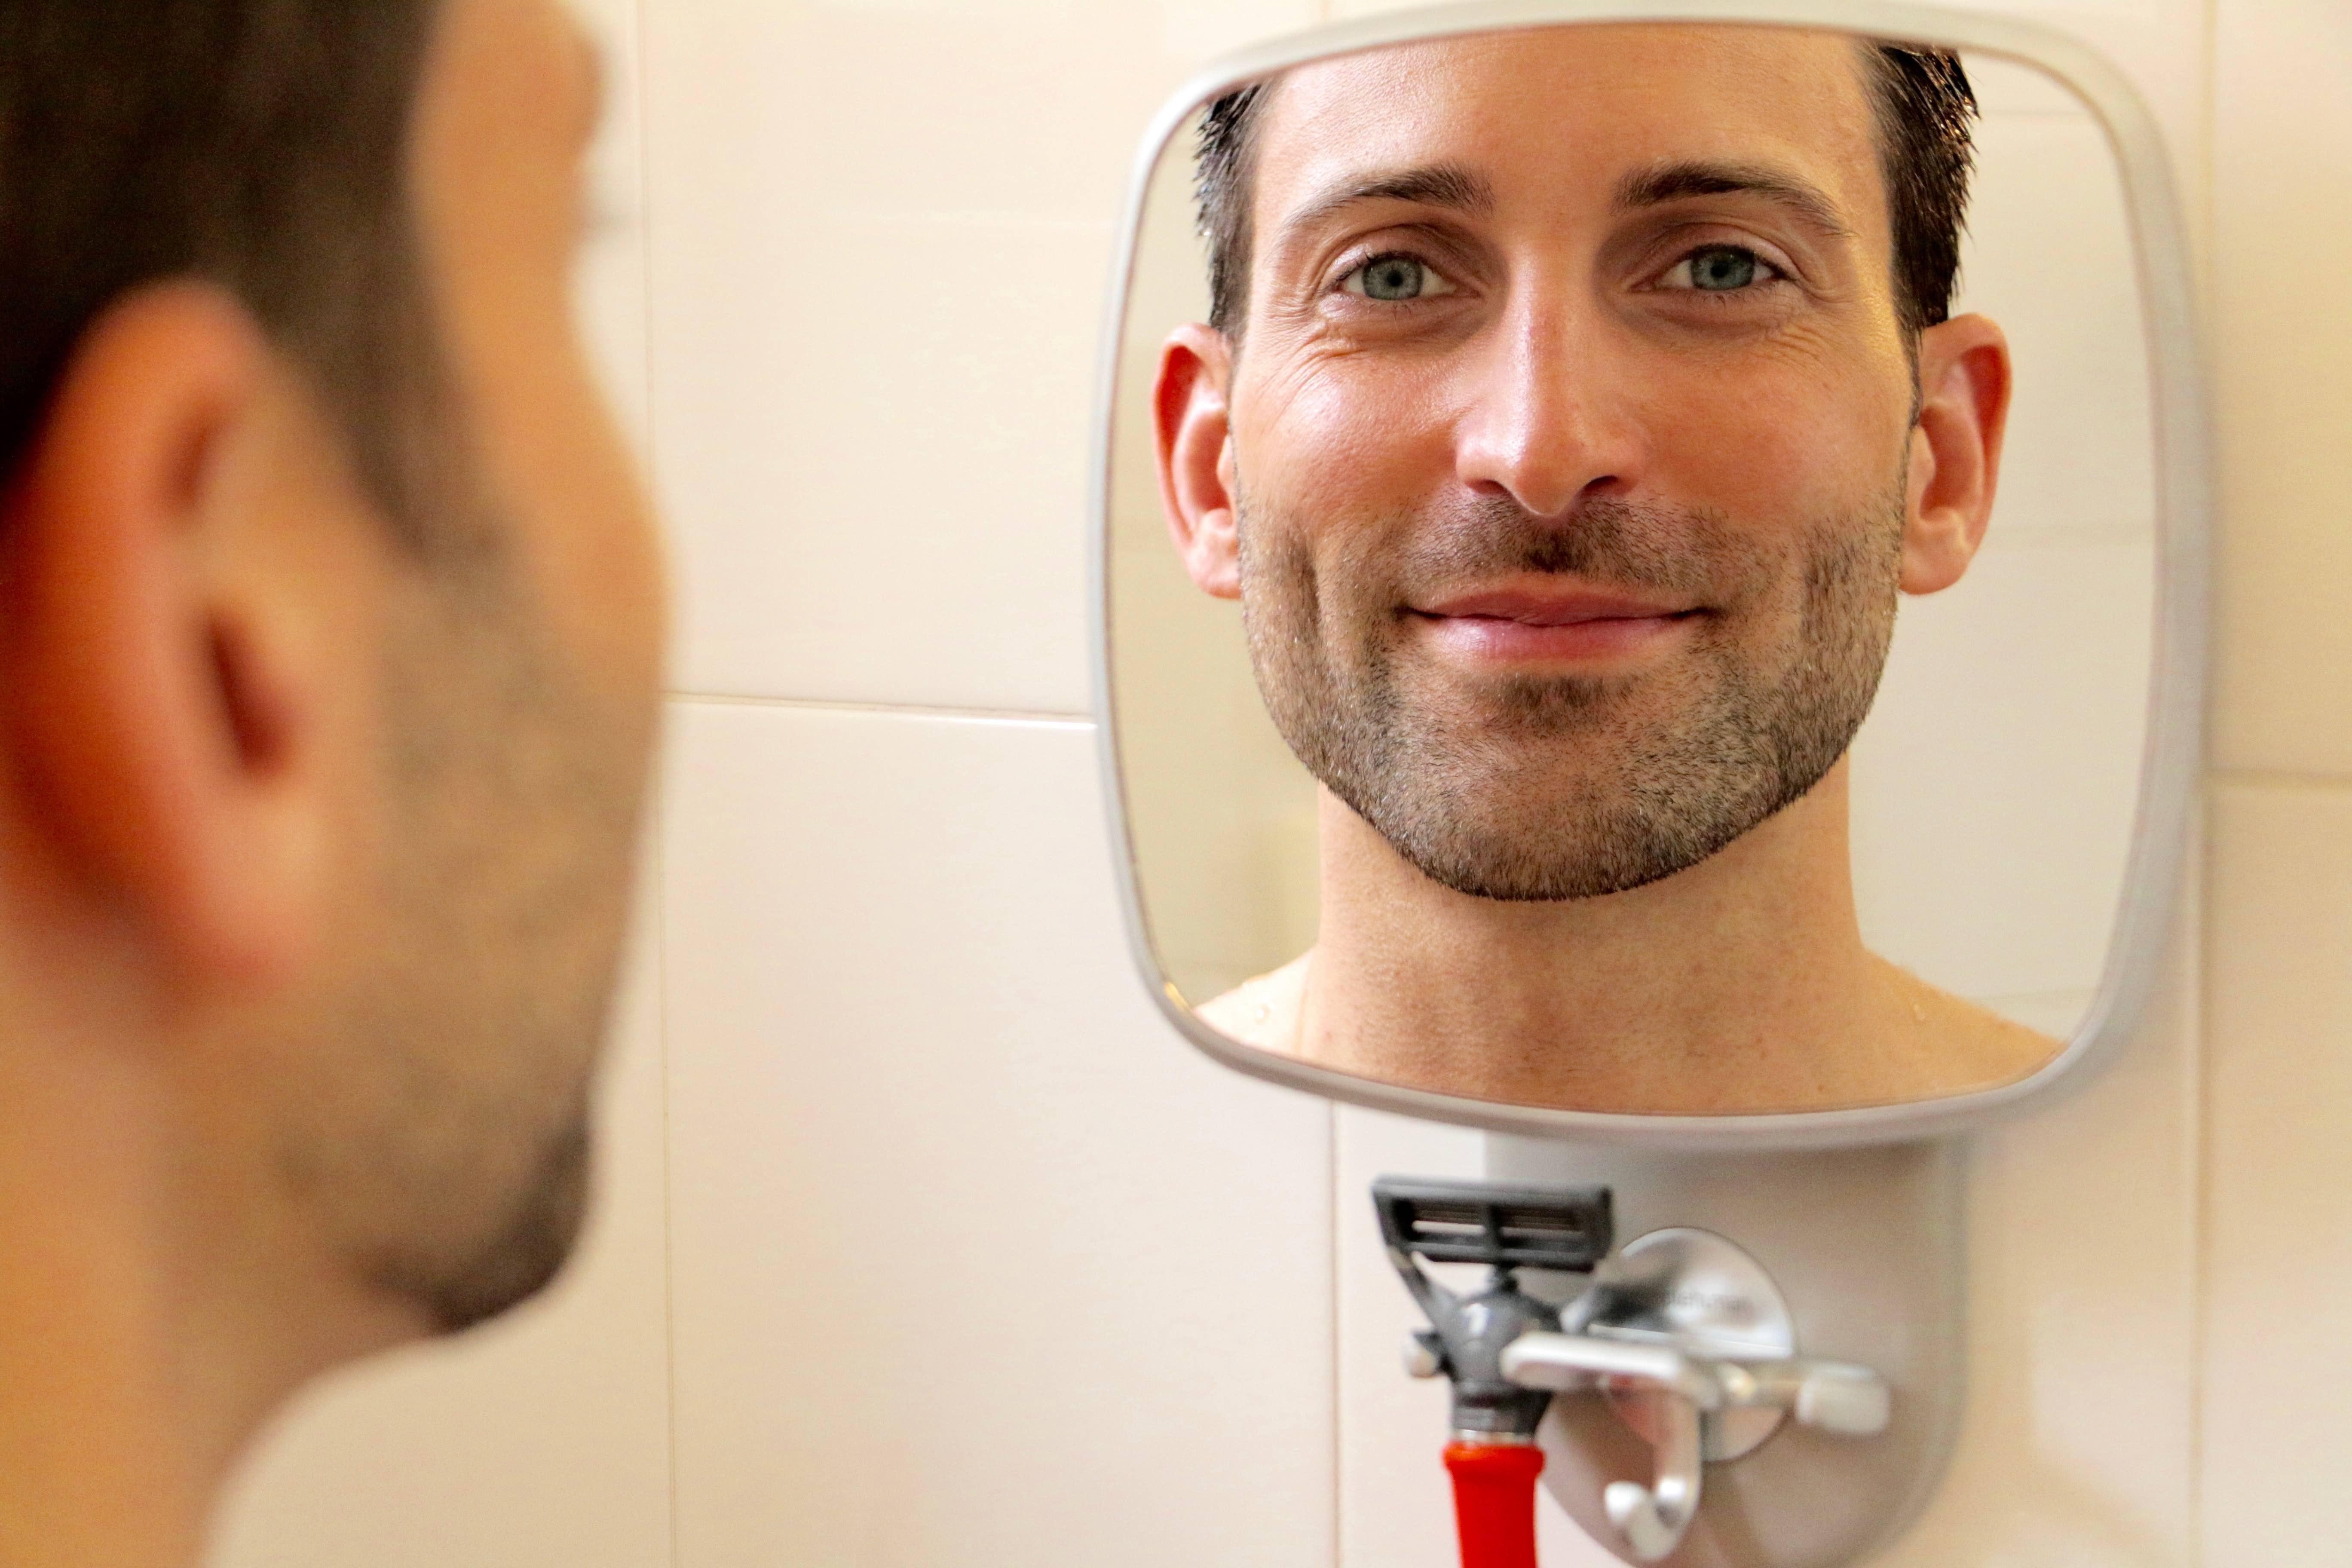 Shaving 14